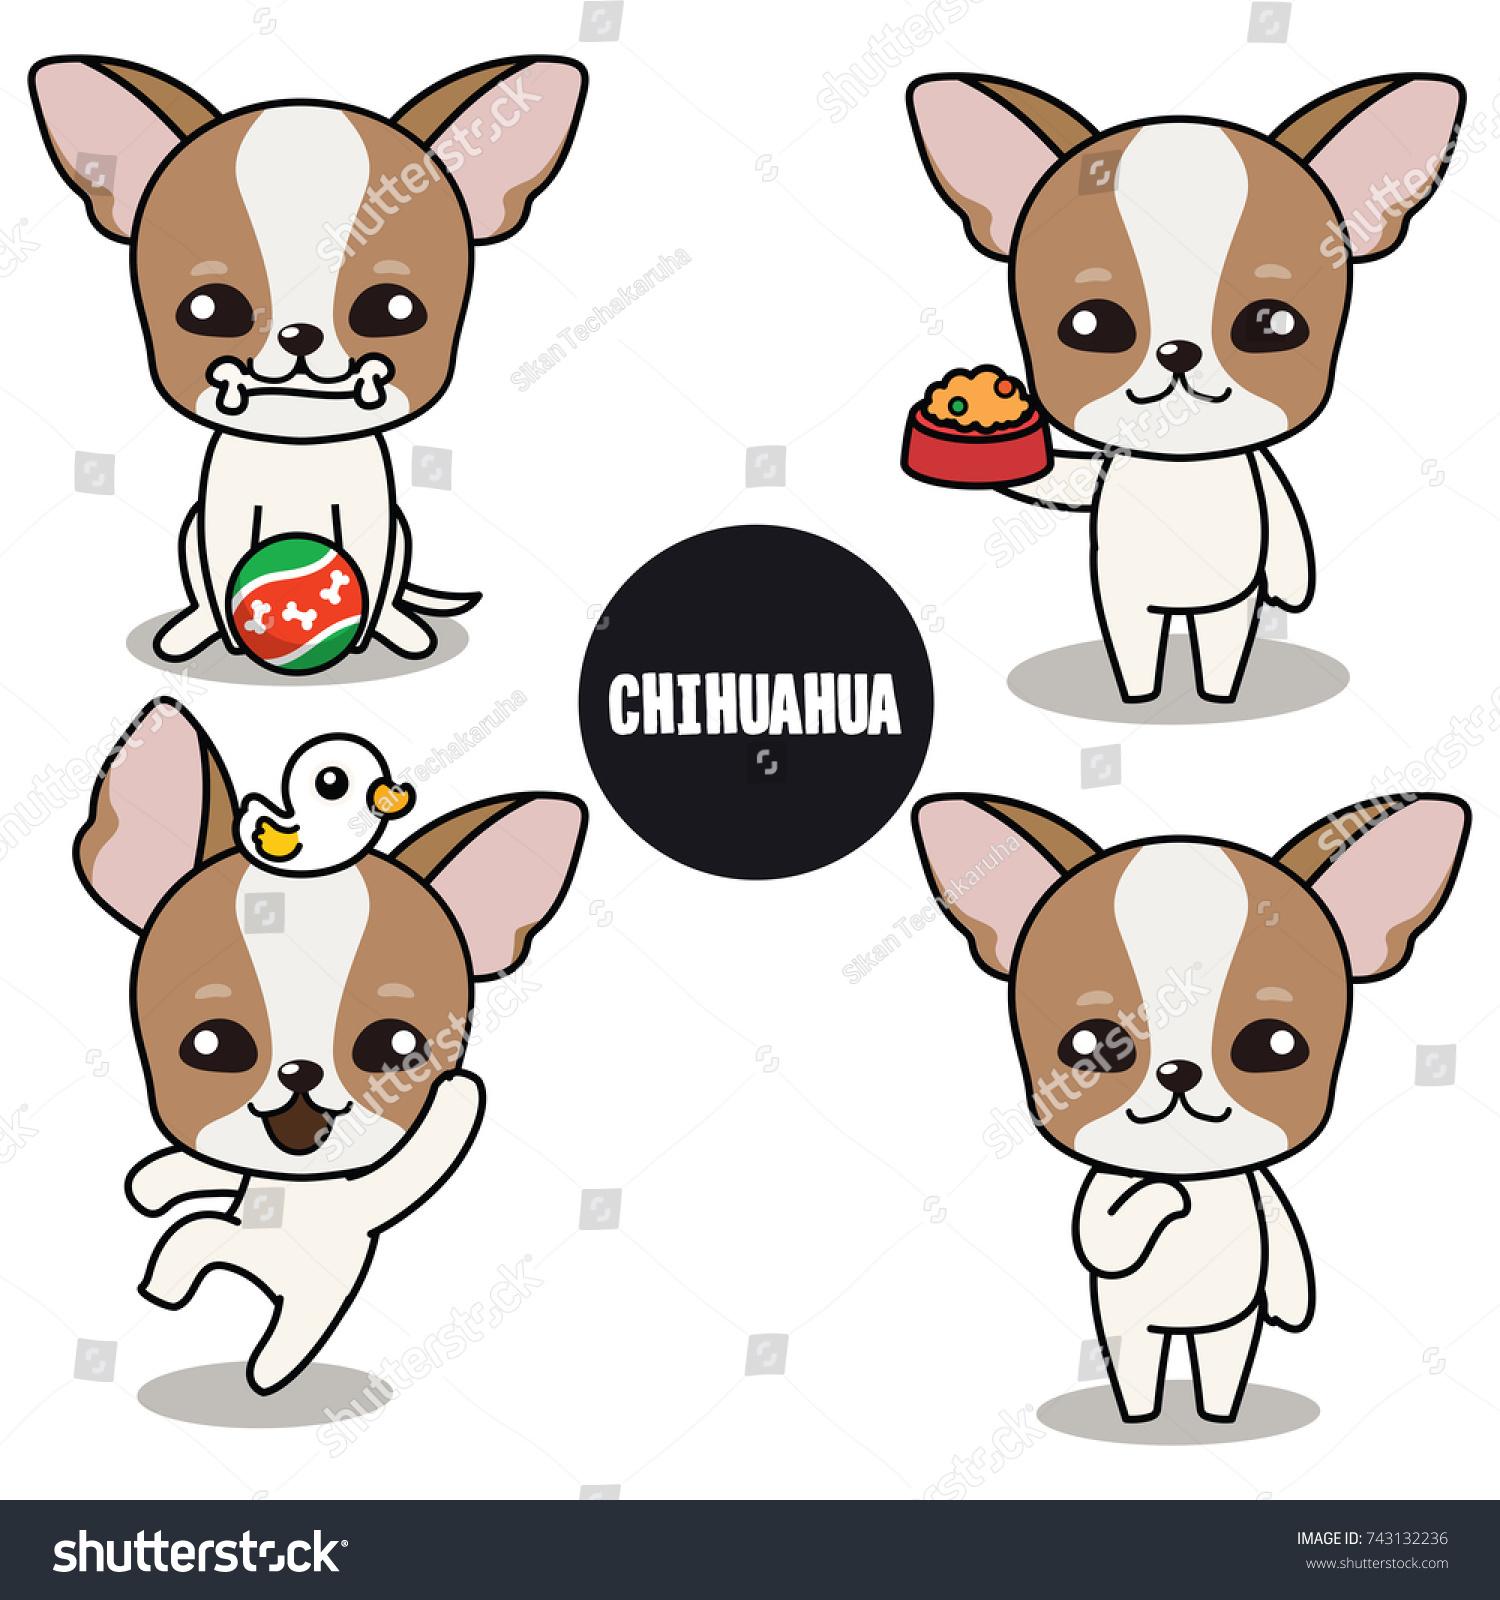 Character Design Brown Chihuahua Short Coat Vector de stock743132236 ...